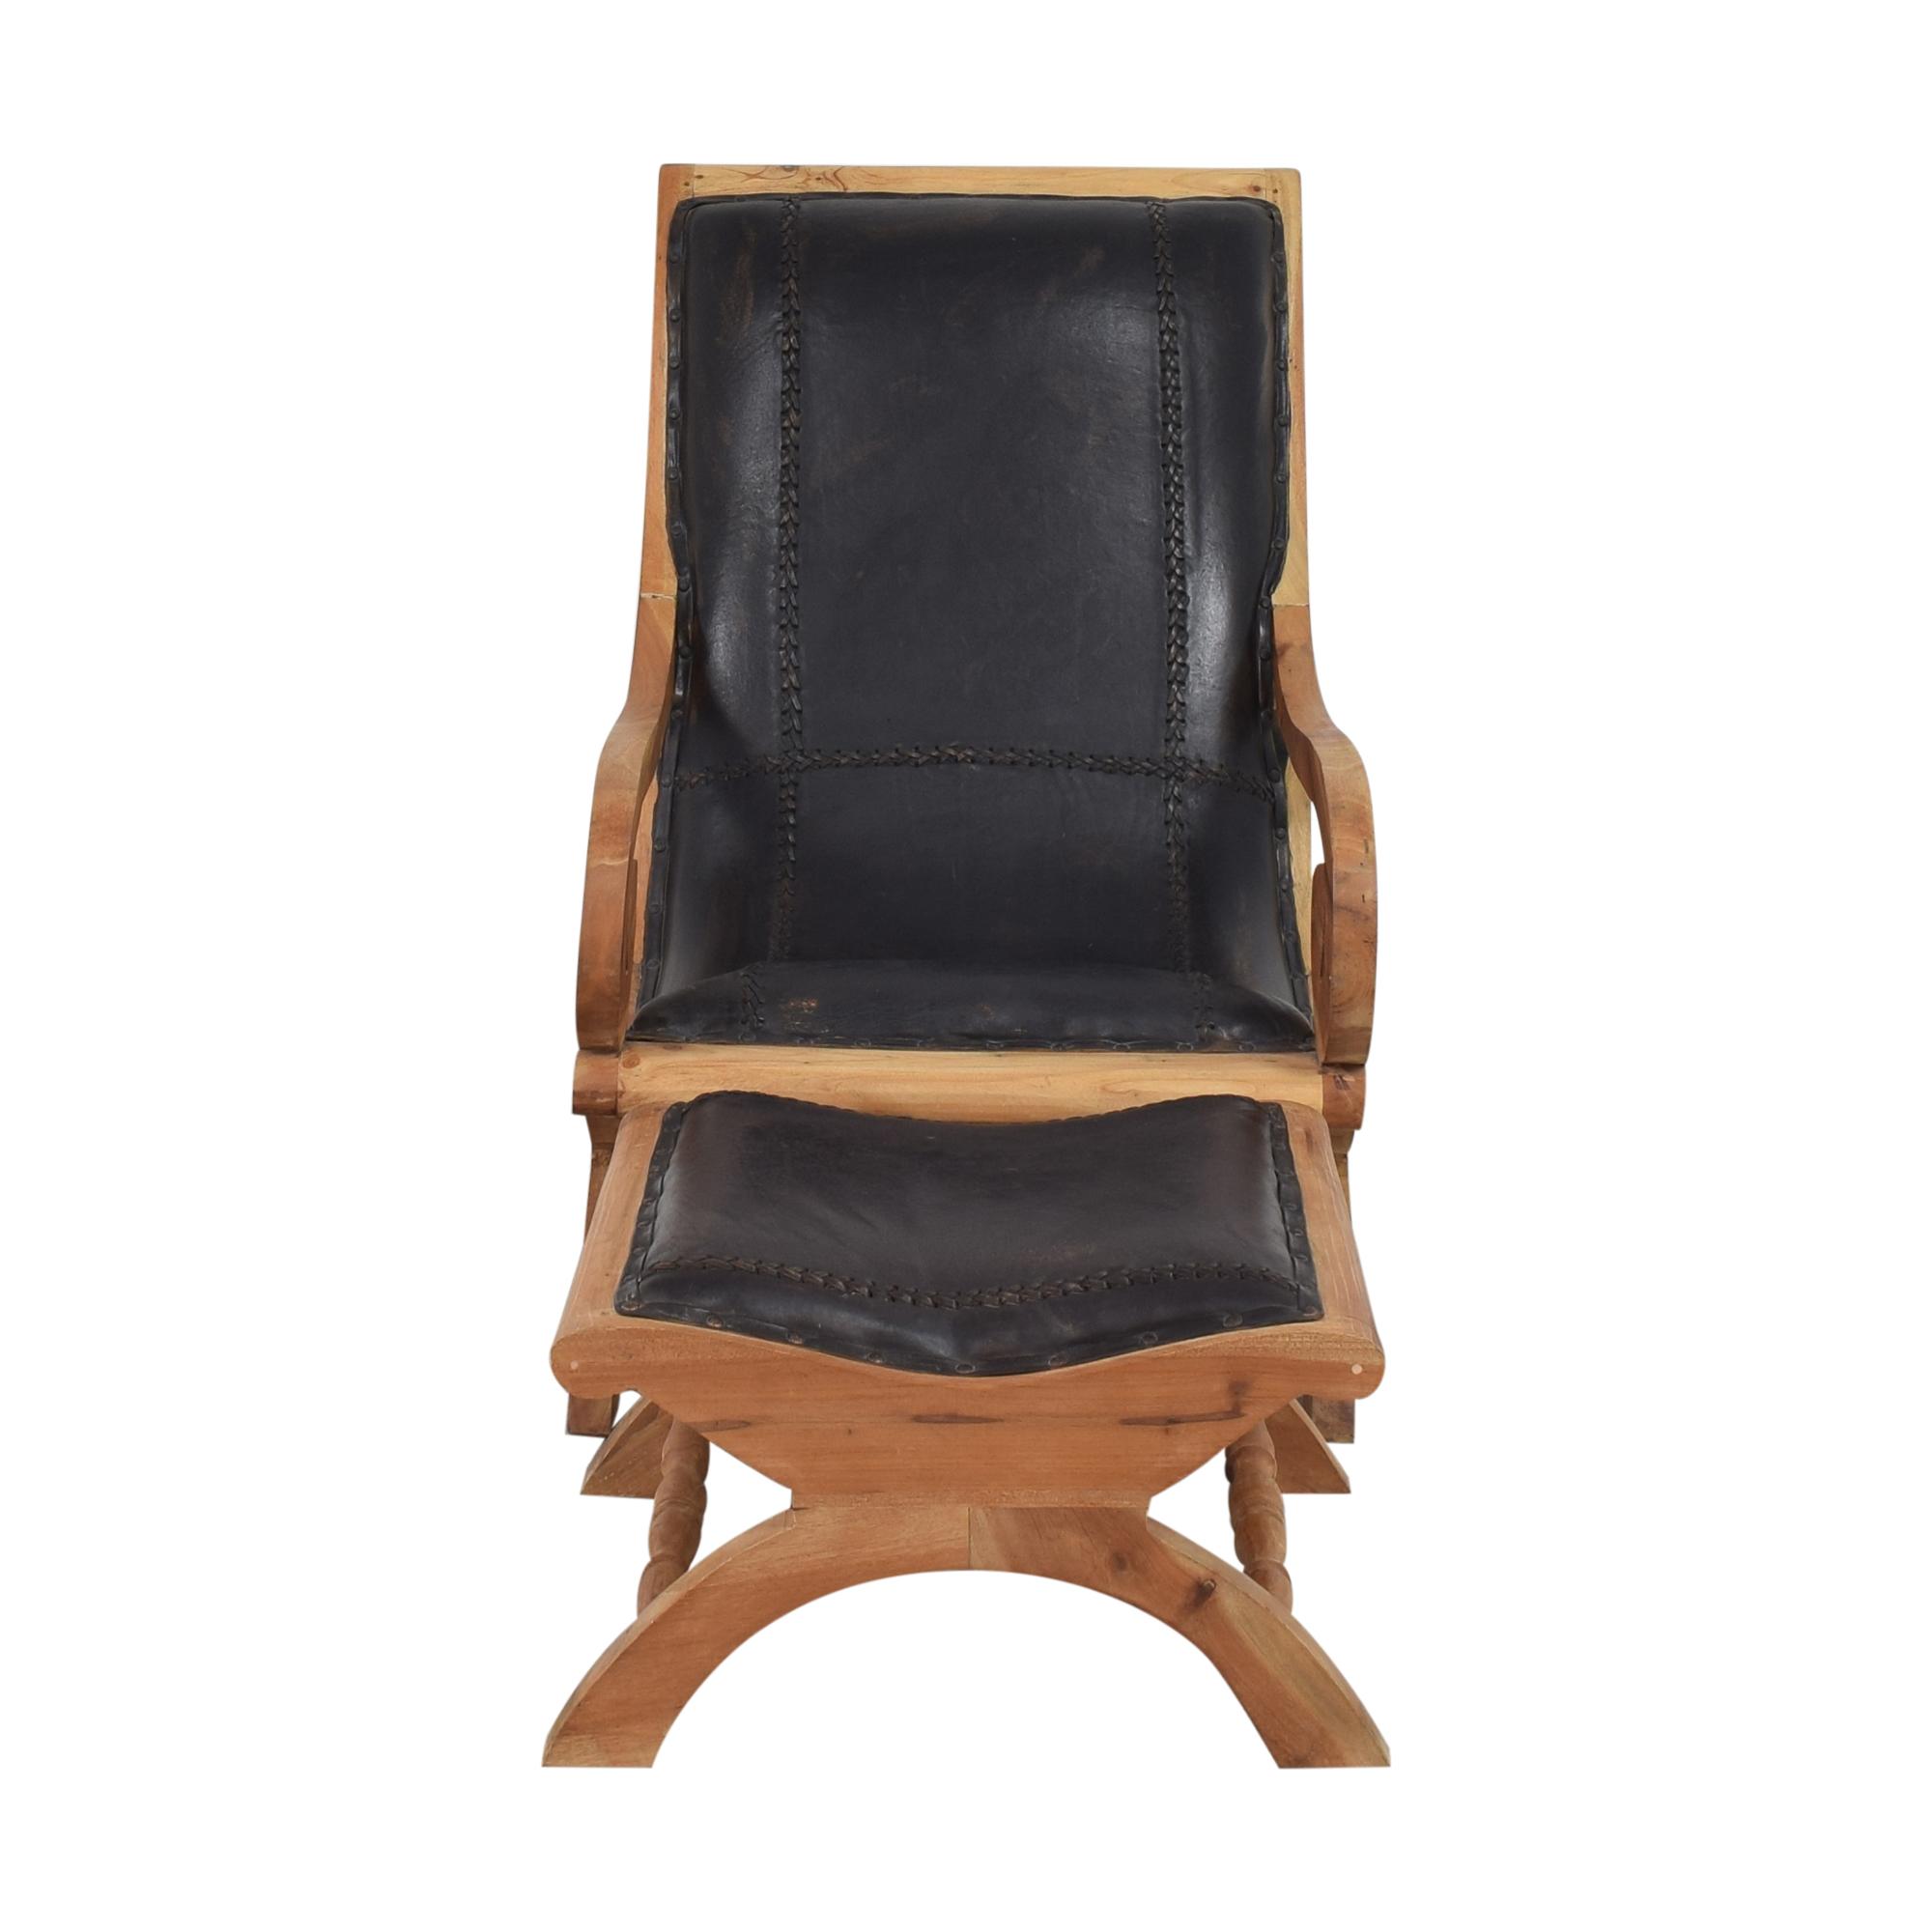 UMA Stetson Chair and Ottoman / Chairs